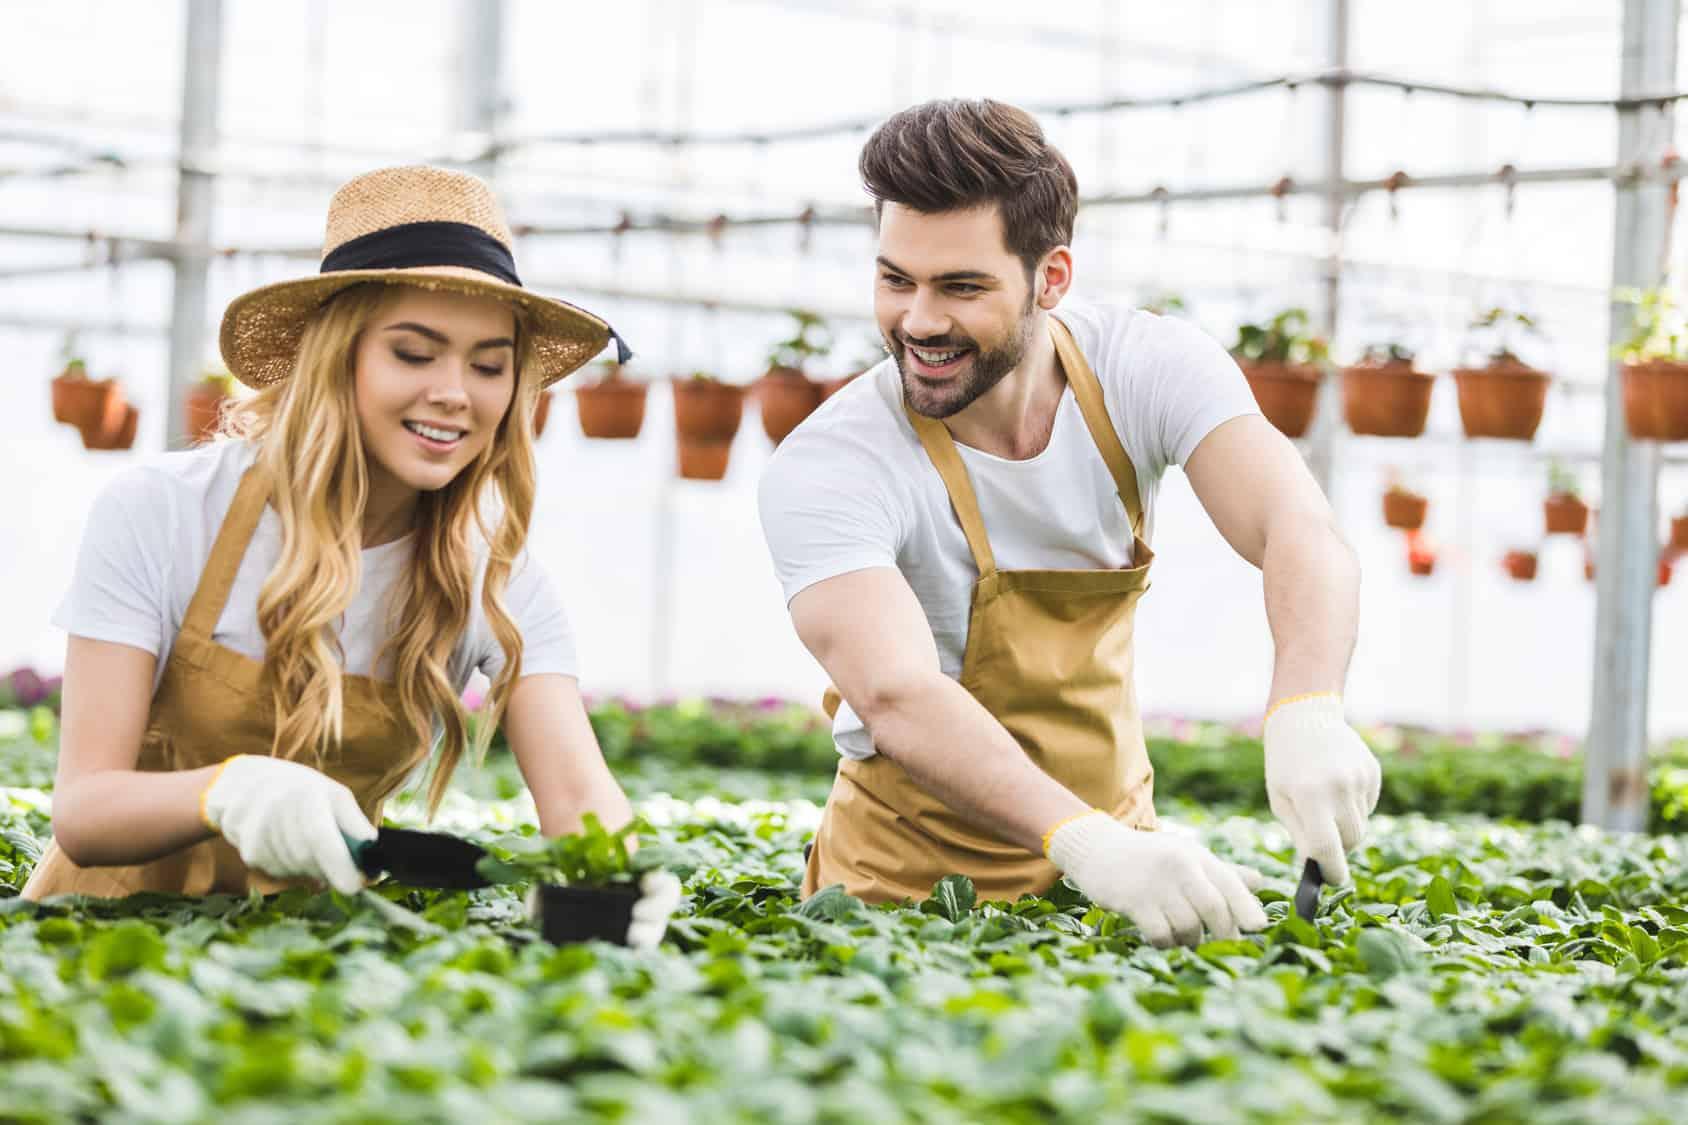 pareja sembrando plantas